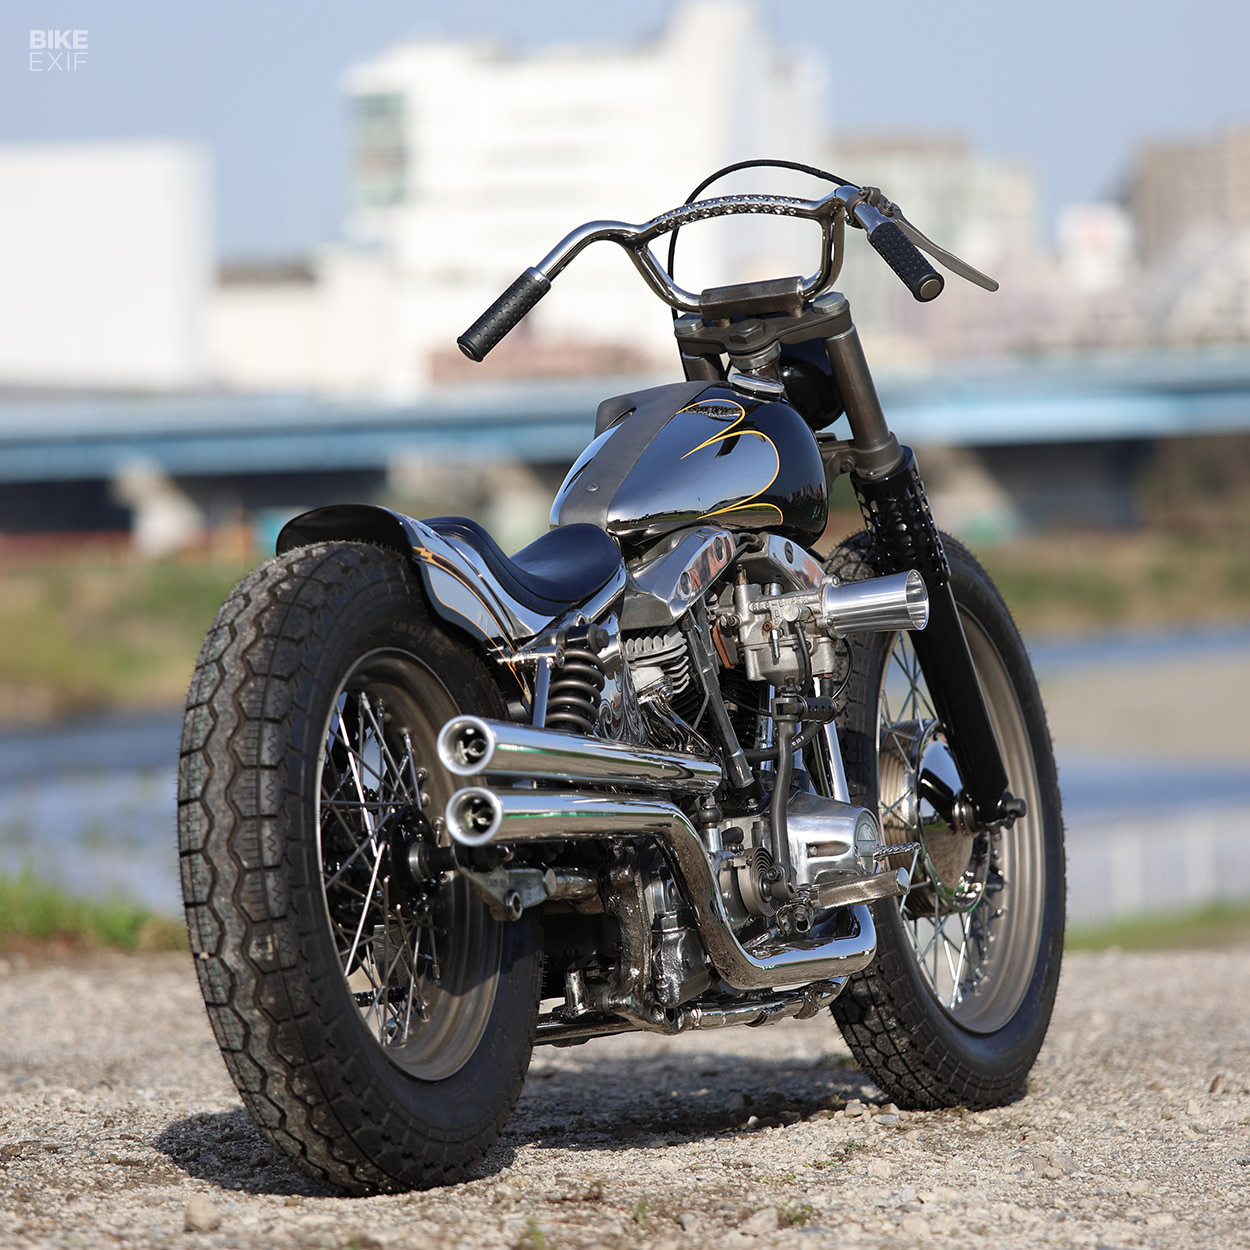 1970 Harley-Davidson FLH Shovelhead by Hide Motorcycle